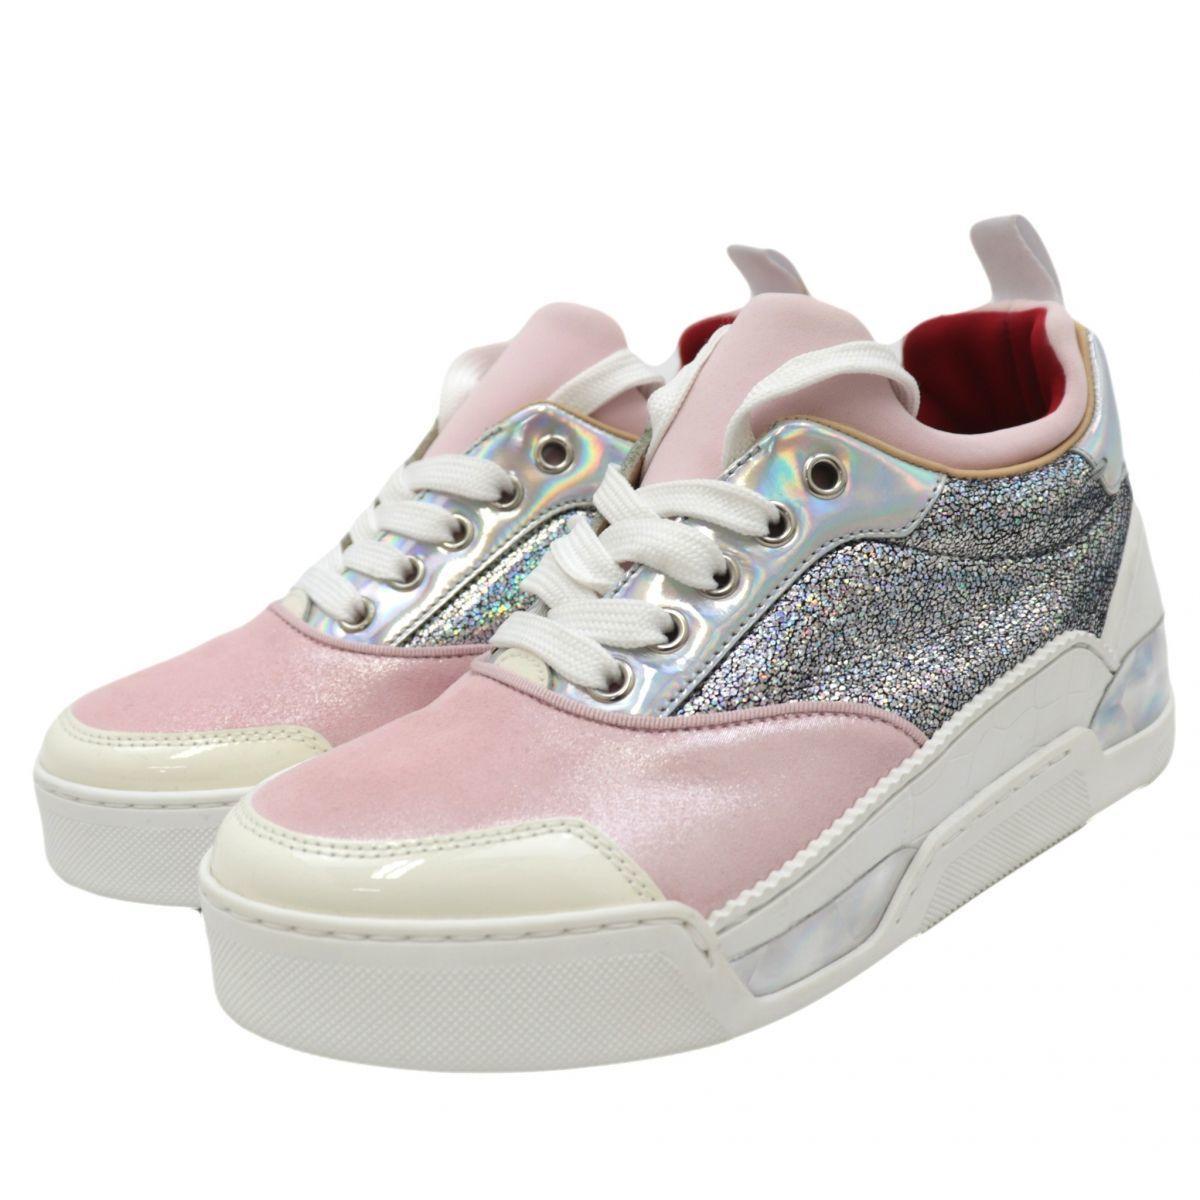 Christian Louboutin Aurelien Hologram Glitter Sneakers Women's Pink Silver 35